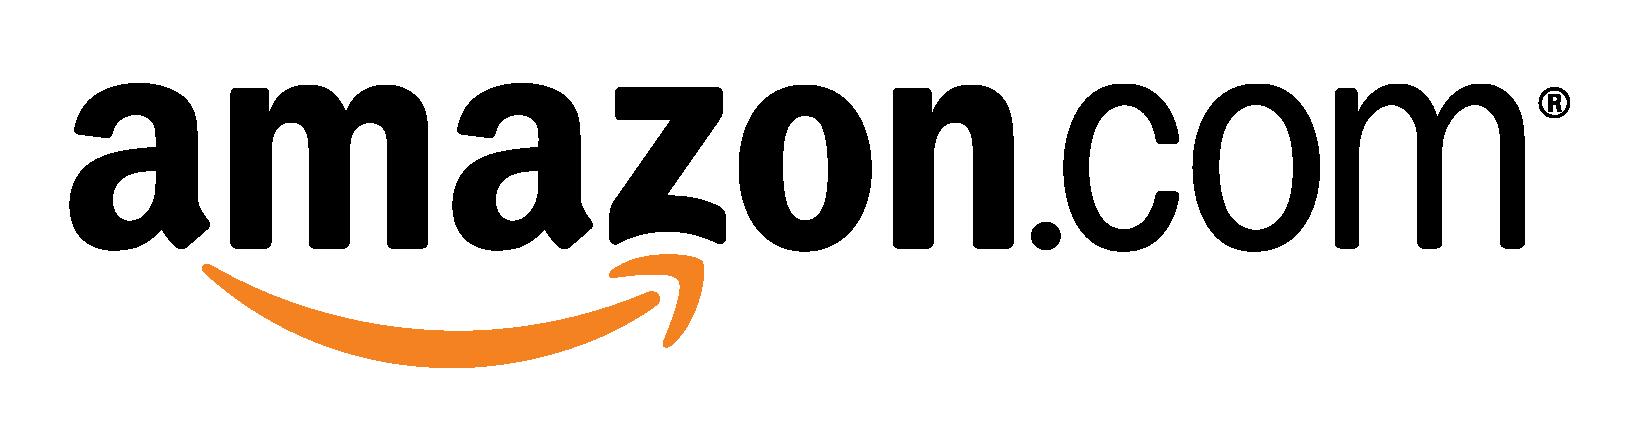 amazon.com-01.png